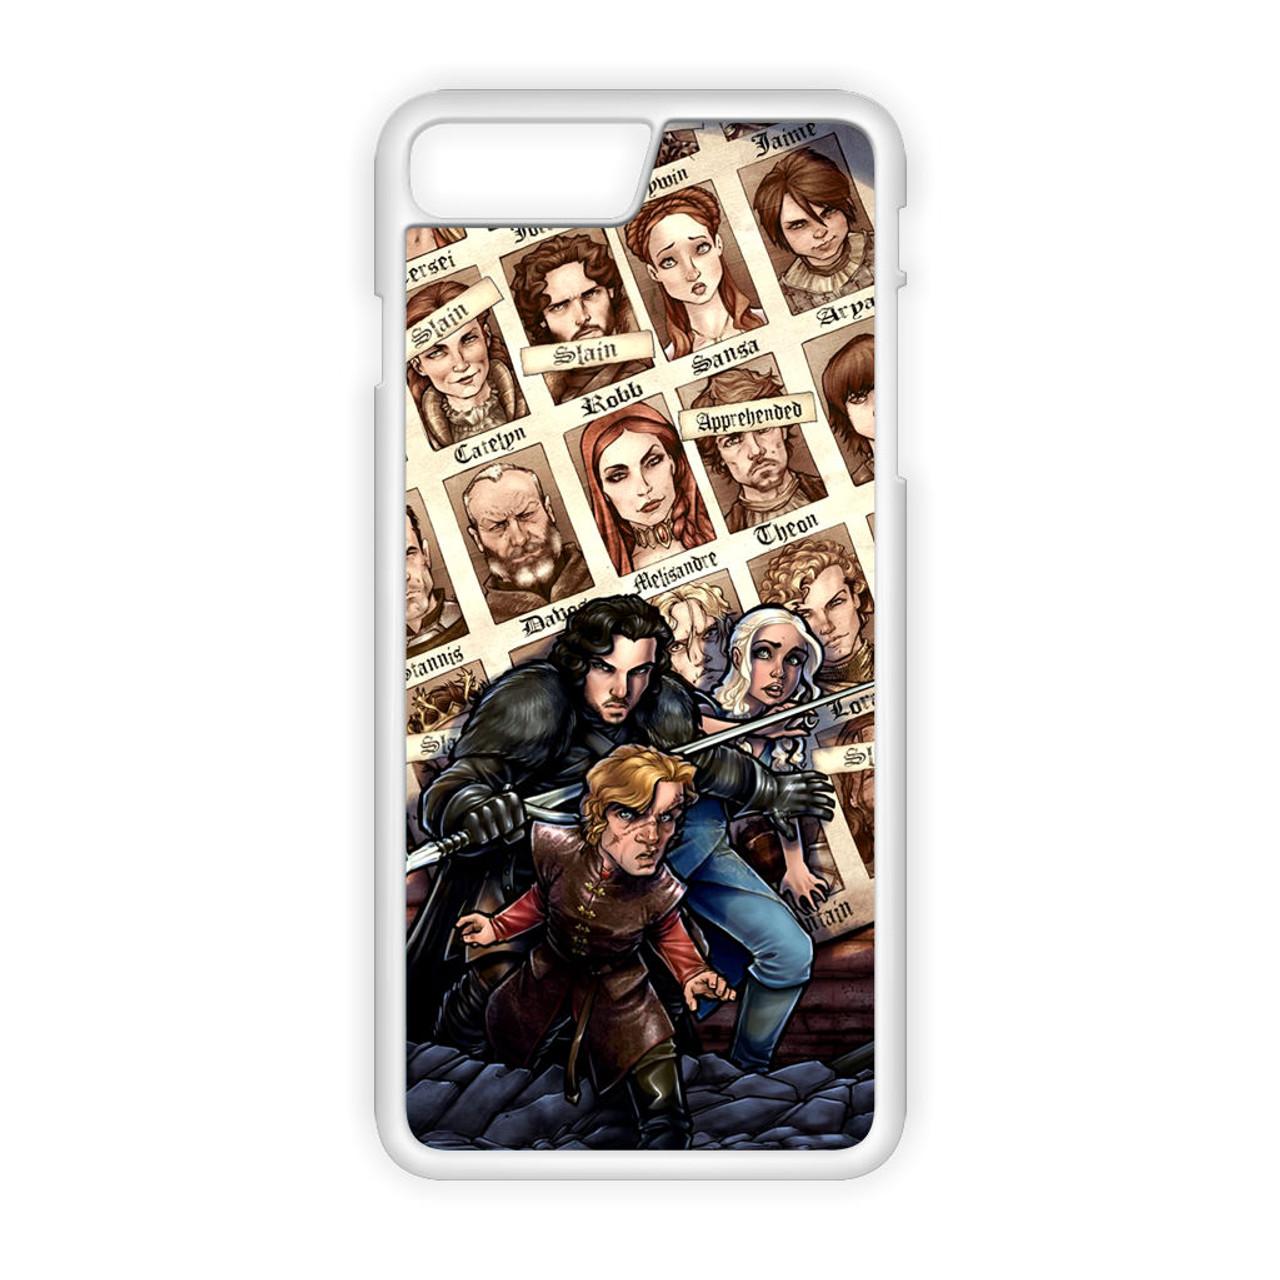 Game of Thrones 3 iphone case